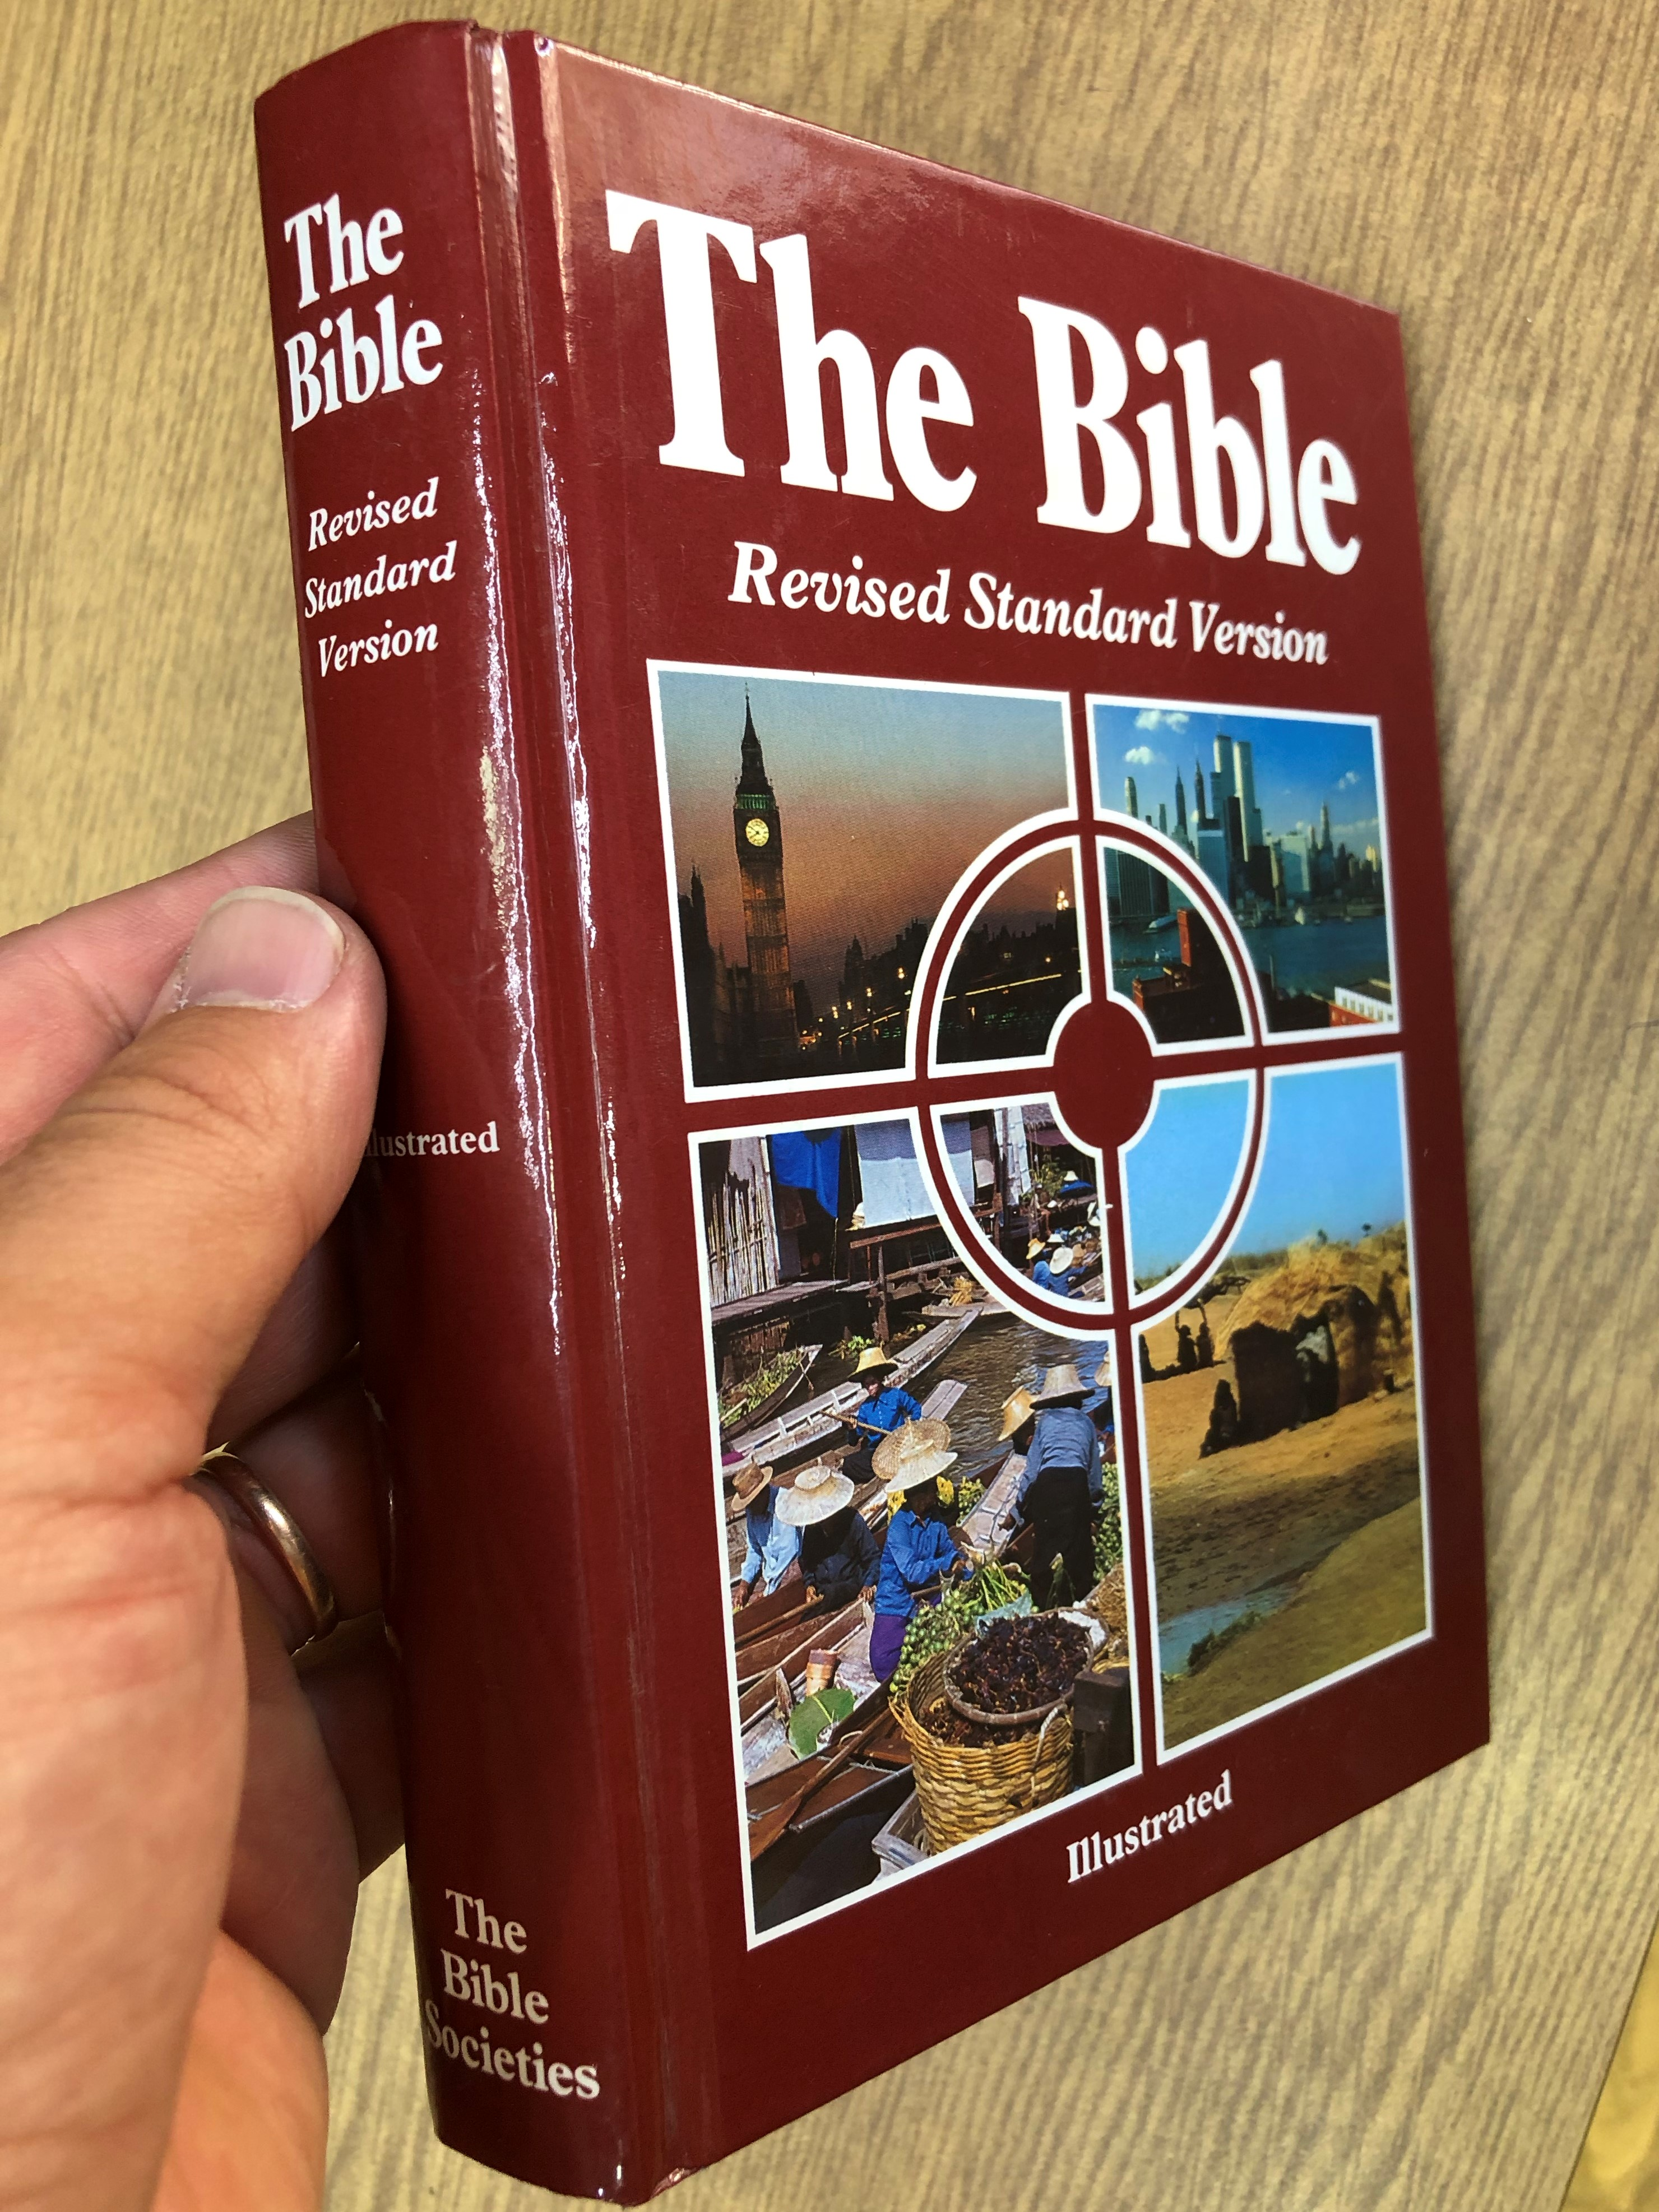 english-bible-revised-standard-version-rsv-burg-15-.jpg